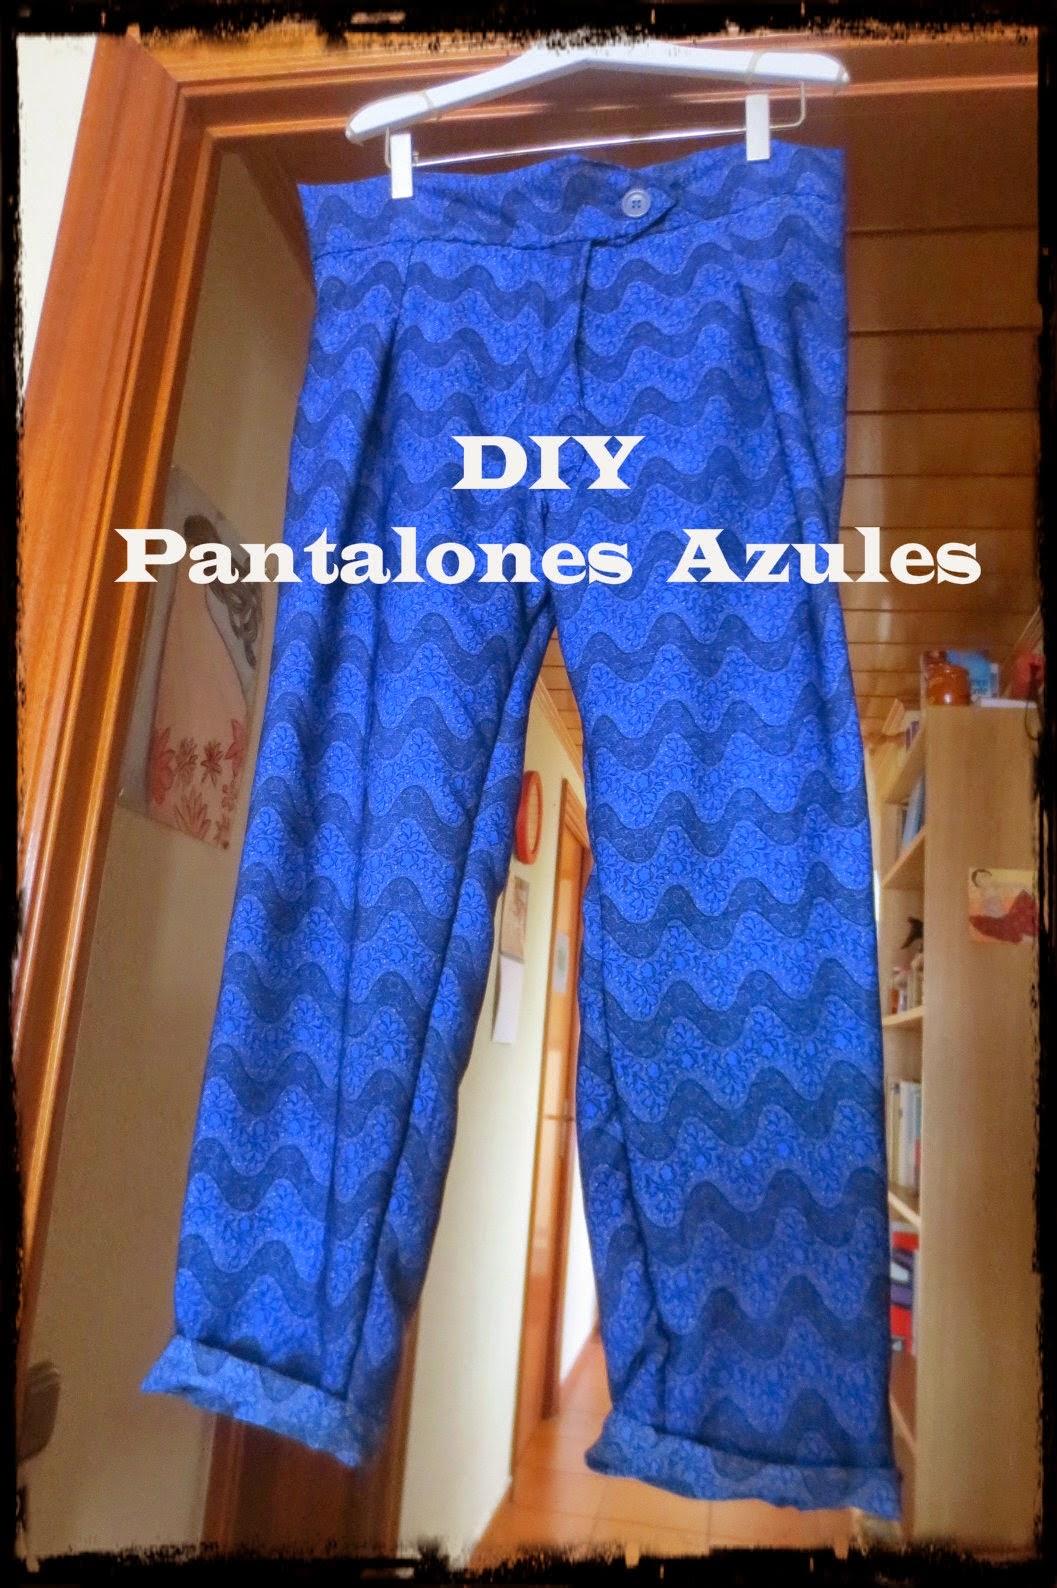 http://laportamagica.blogspot.com.es/2014/07/diy-pantalones-azules.html